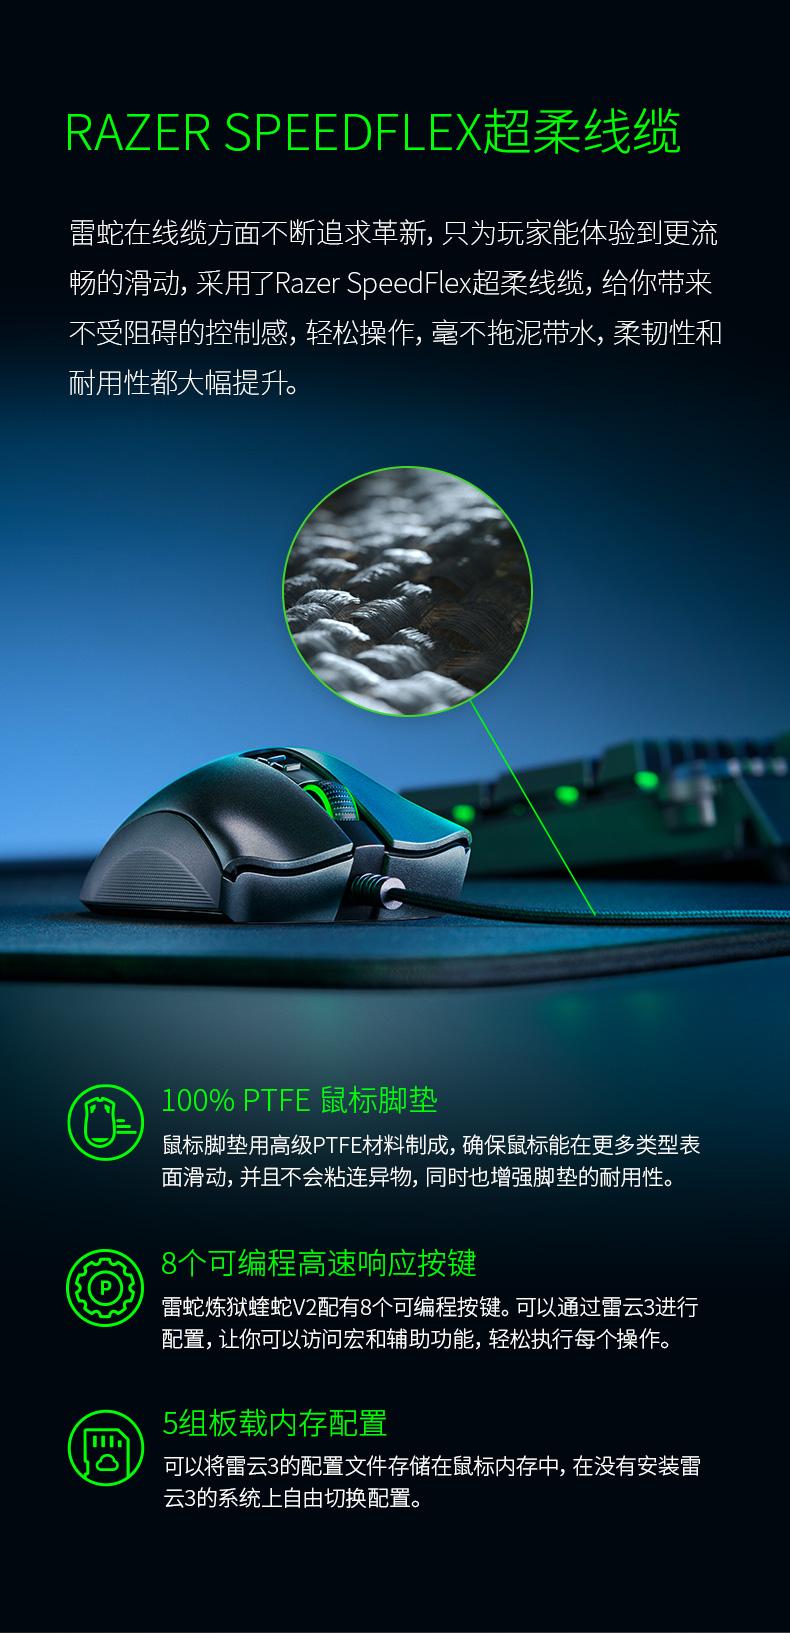 RAZER SPEEDFLEX超柔线缆雷蛇在线缆方面不断追求革新,只为玩家能体验到更流畅的滑动,采用了 Razer speedfle超柔线缆,给你带来不受阻碍的控制感,轻松操作,毫不拖泥带水,柔韧性和耐用性都大幅提升。100%PTFE鼠标脚垫鼠标脚垫用高级PTFE材料制成,确保鼠标能在更多类型表面滑动,并且不会粘连异物,同时也增强脚垫的耐用性。8个可编程高速响应按键雷蛇炼狱蝰蛇V配有8个可编程按键。可以通过雷云3进行配置,让你可以访问宏和辅助功能,轻松执行每个操作5组板载内存配置可以将雷云3的配置文件存储在鼠标内存中,在没有安装雷云3的系统上自由切换配置-推好价 | 品质生活 精选好价